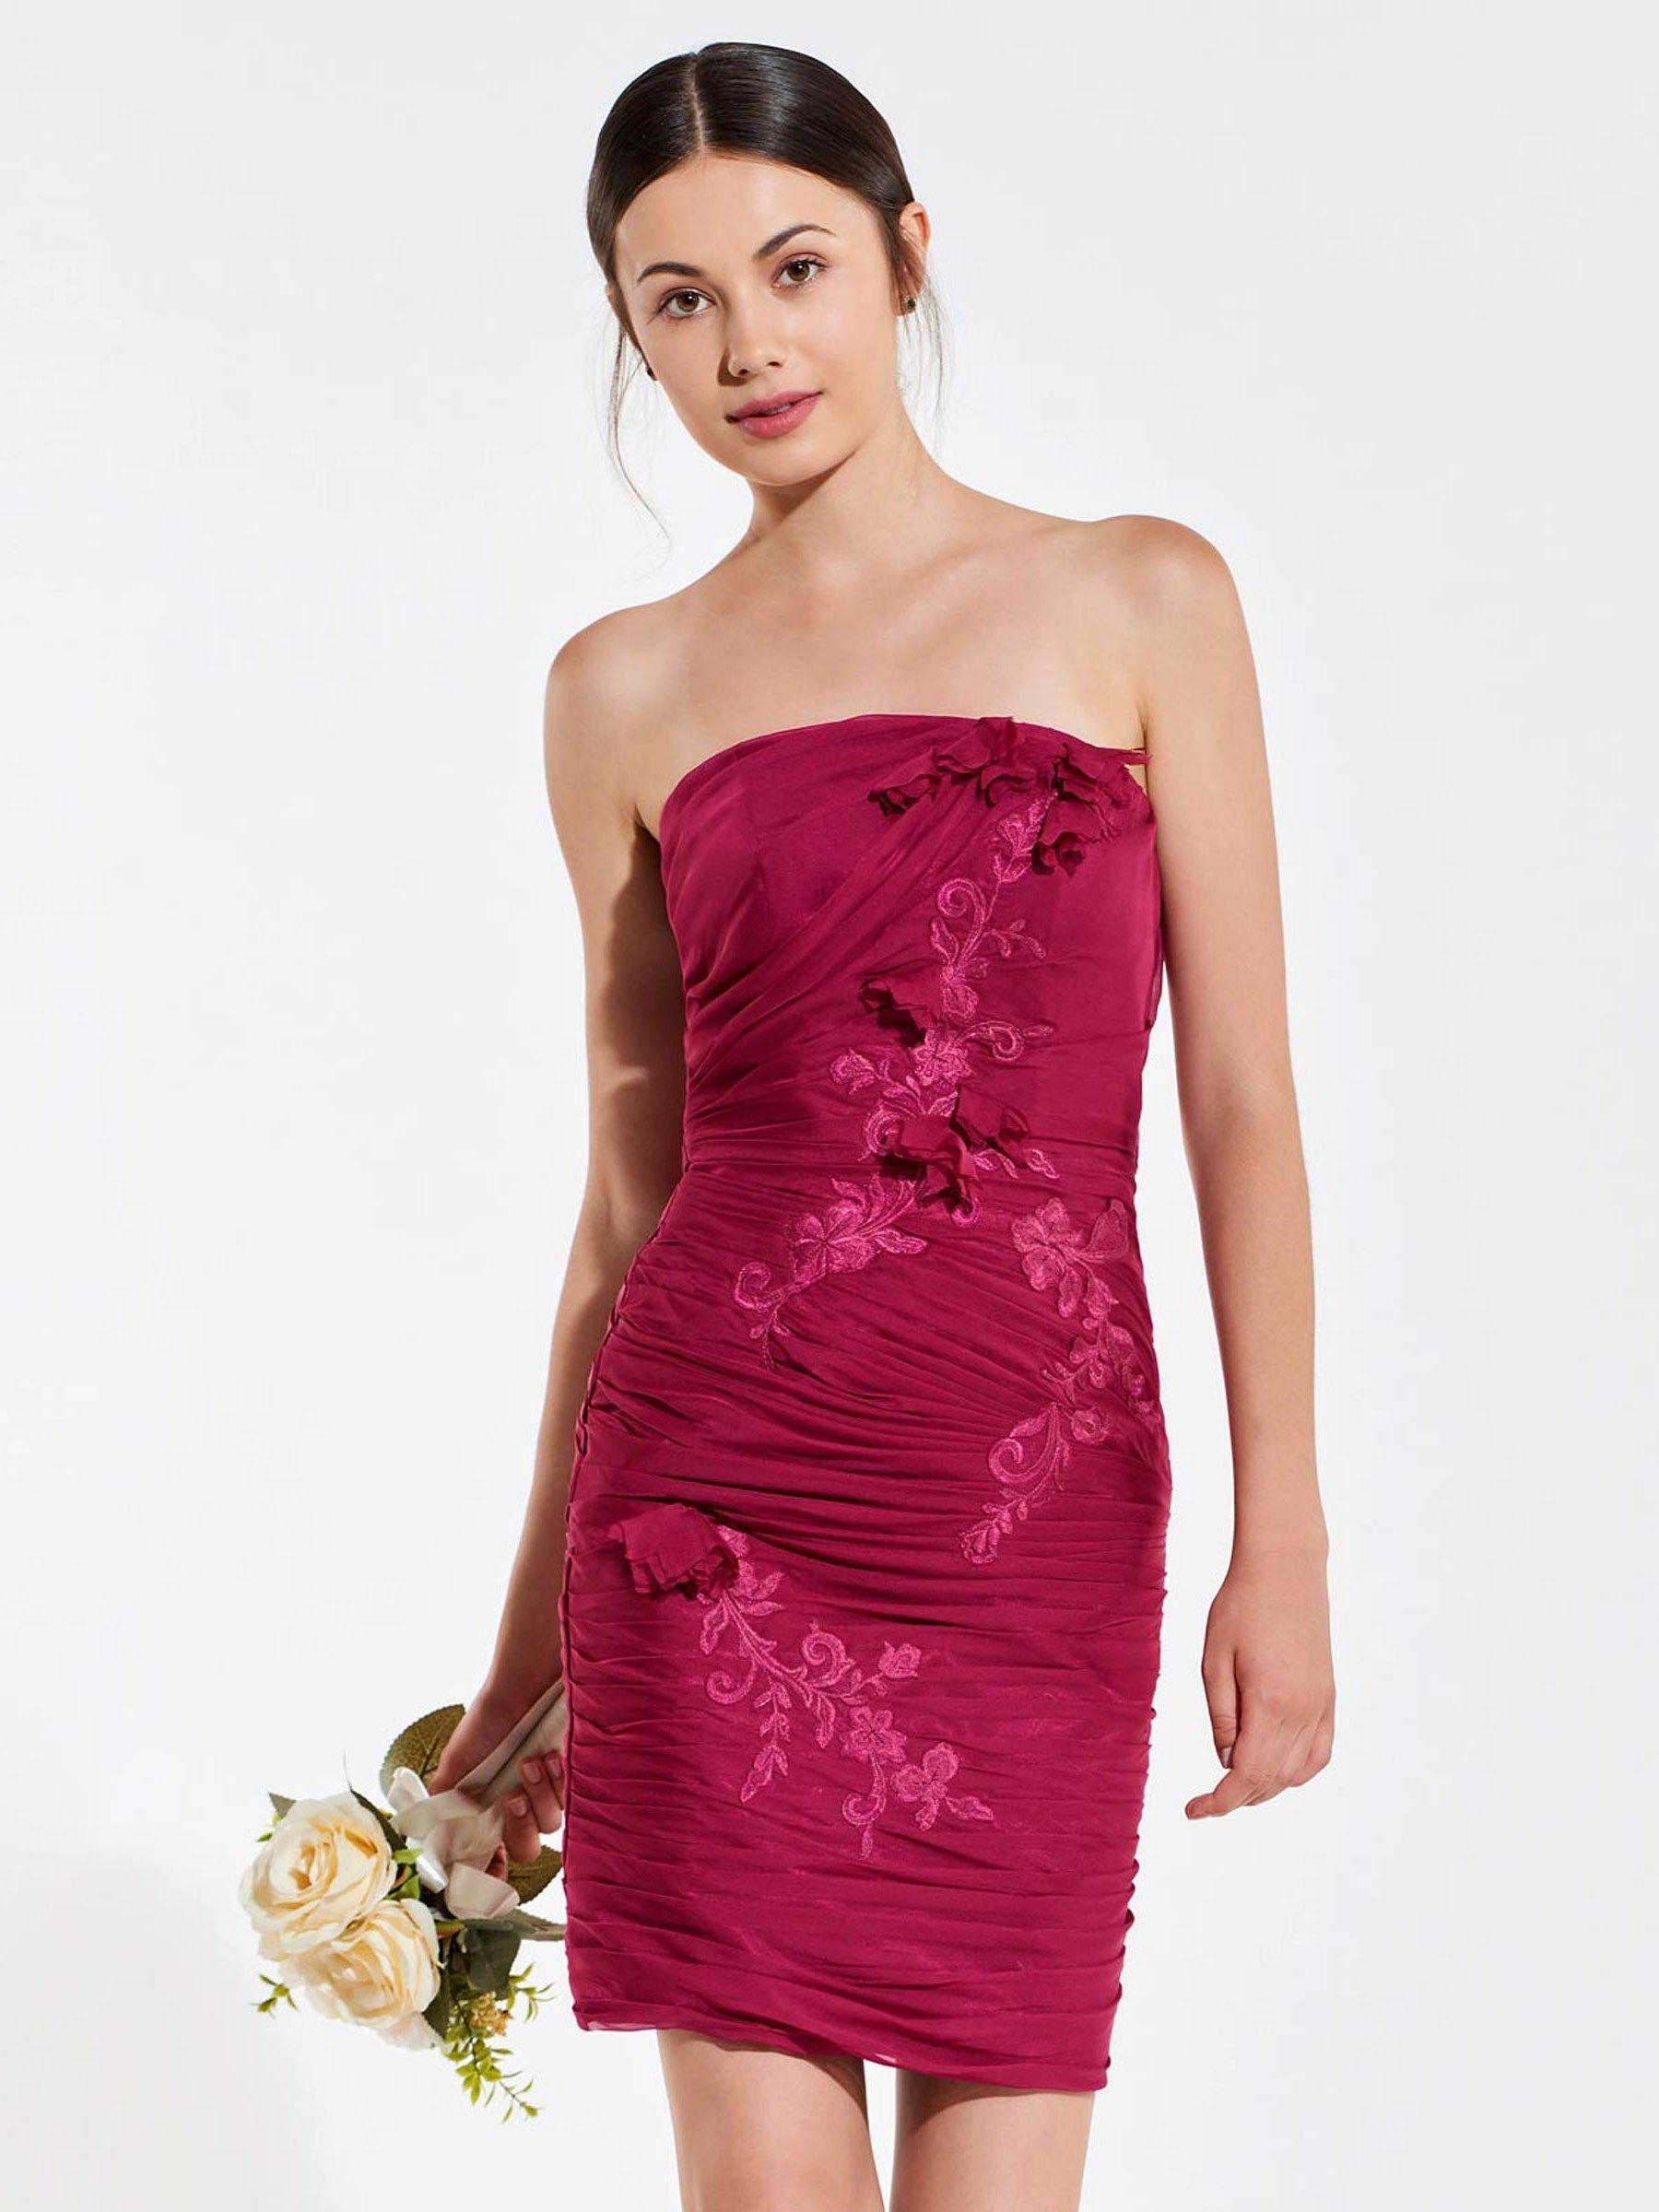 Strapless appliques pleats column bridesmaid dress wedding lovin